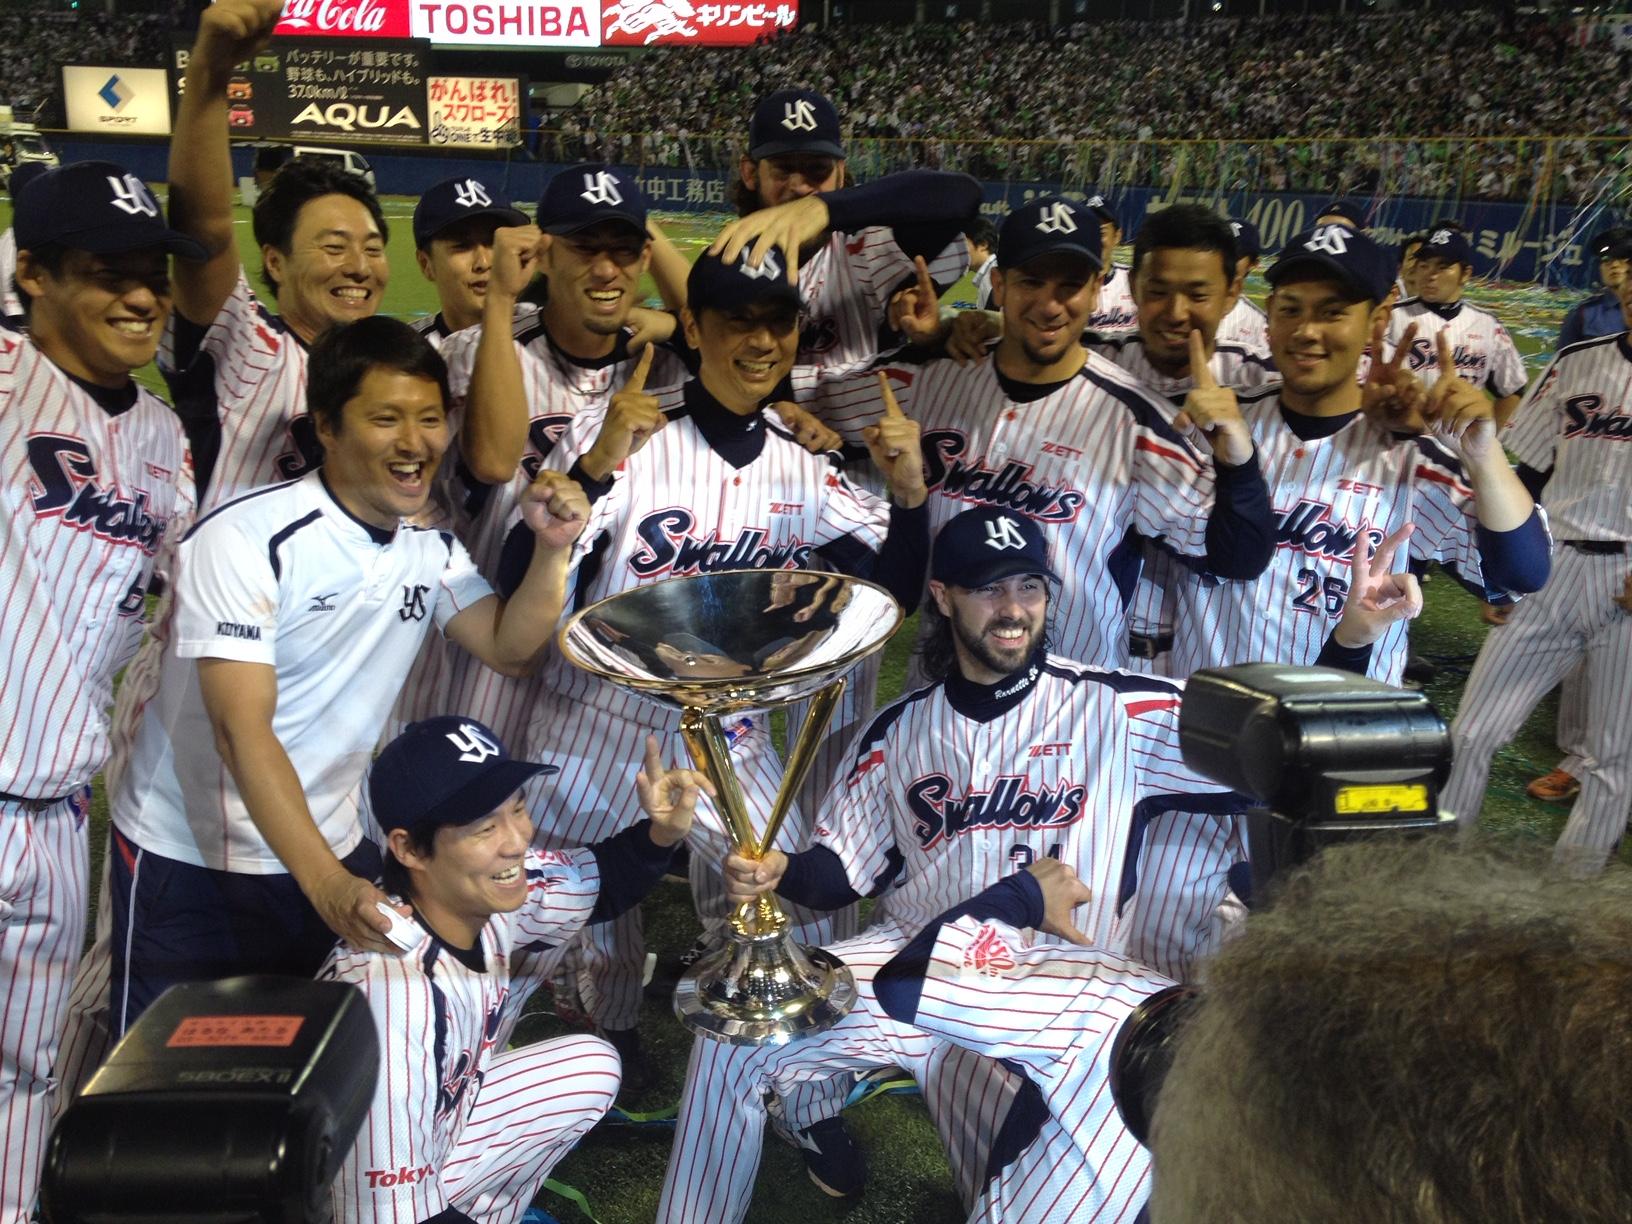 Tony Barnette and Japan